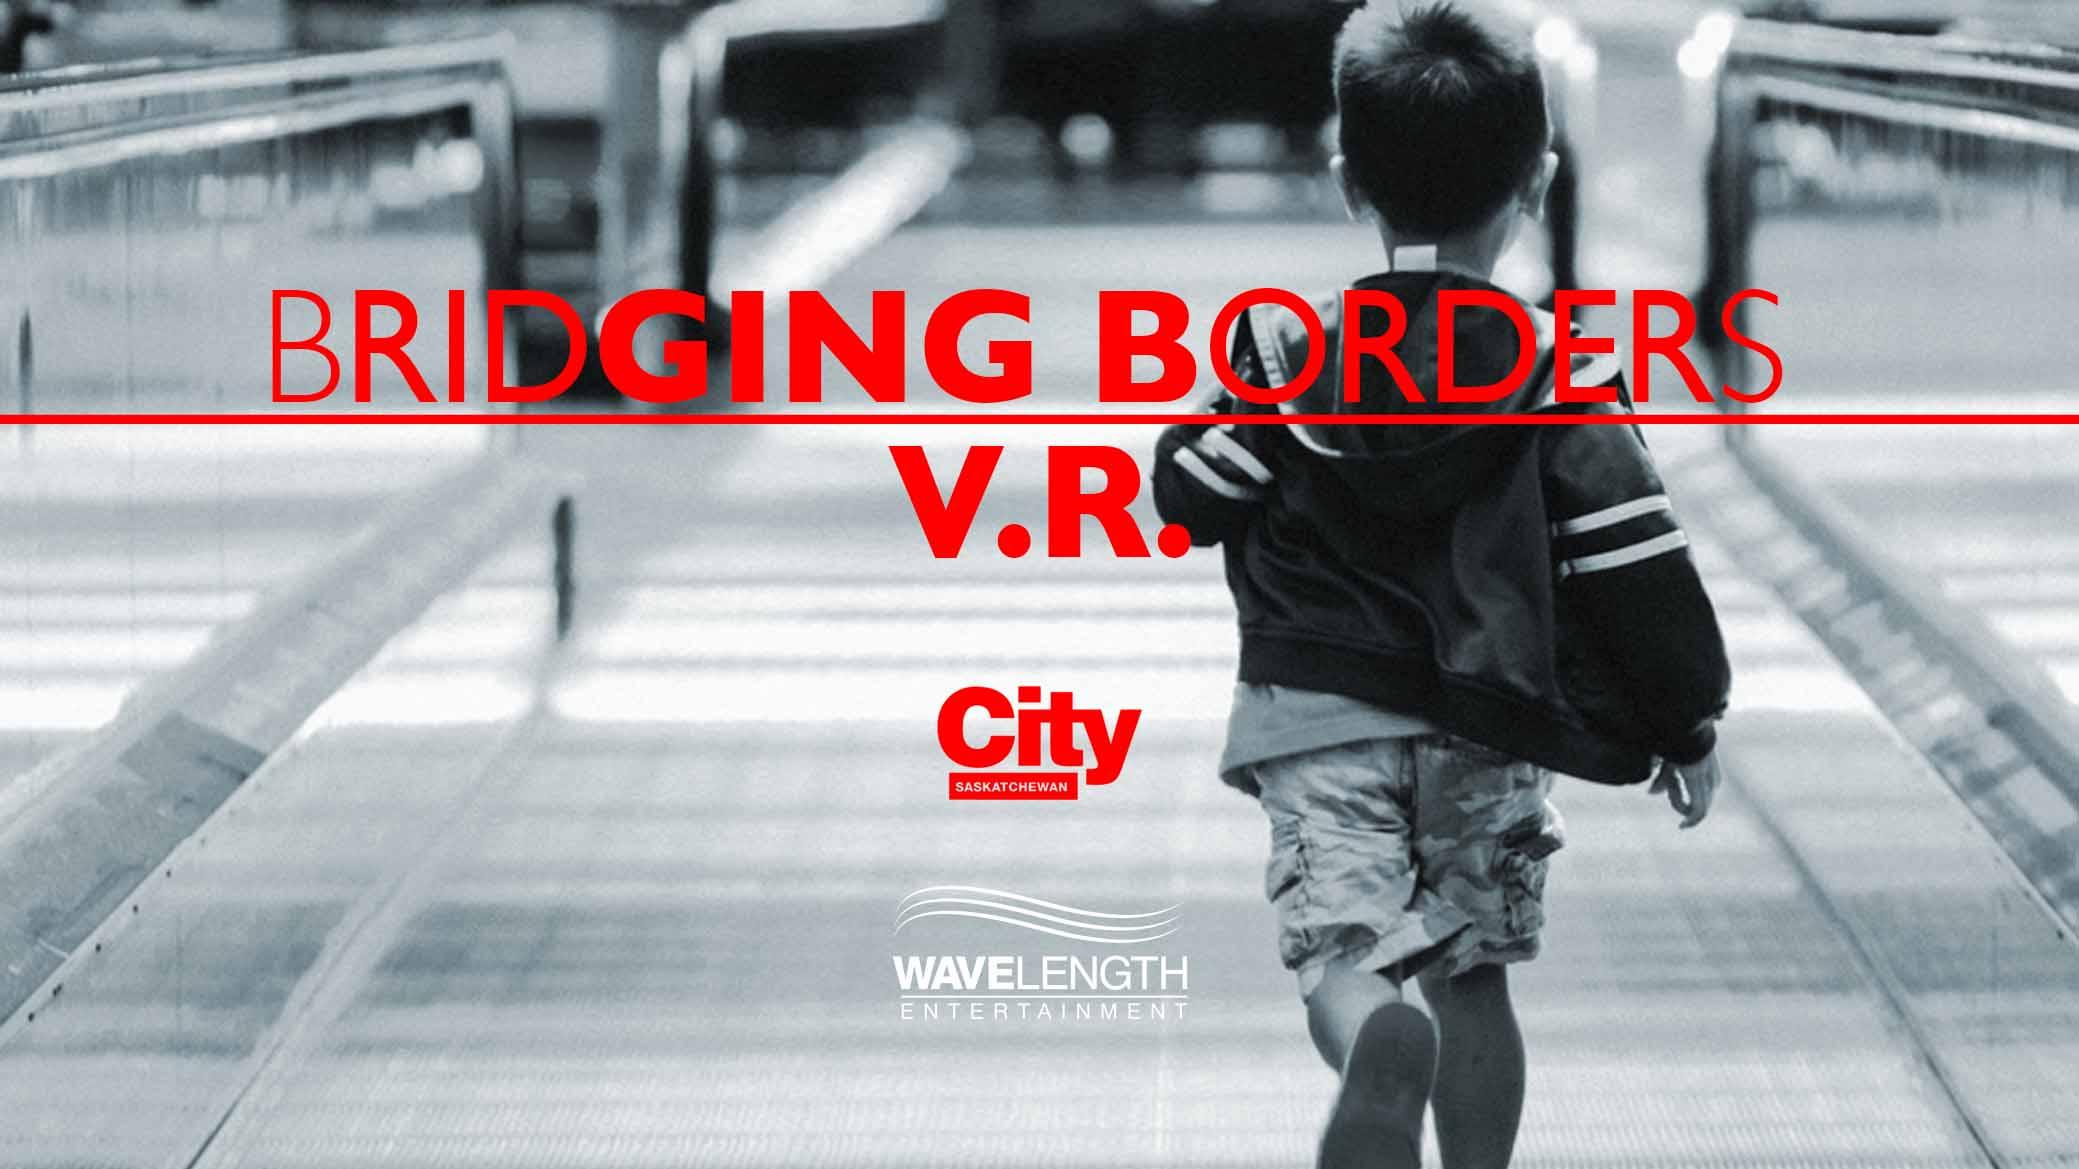 Bridging Borders VR 16x9.jpg